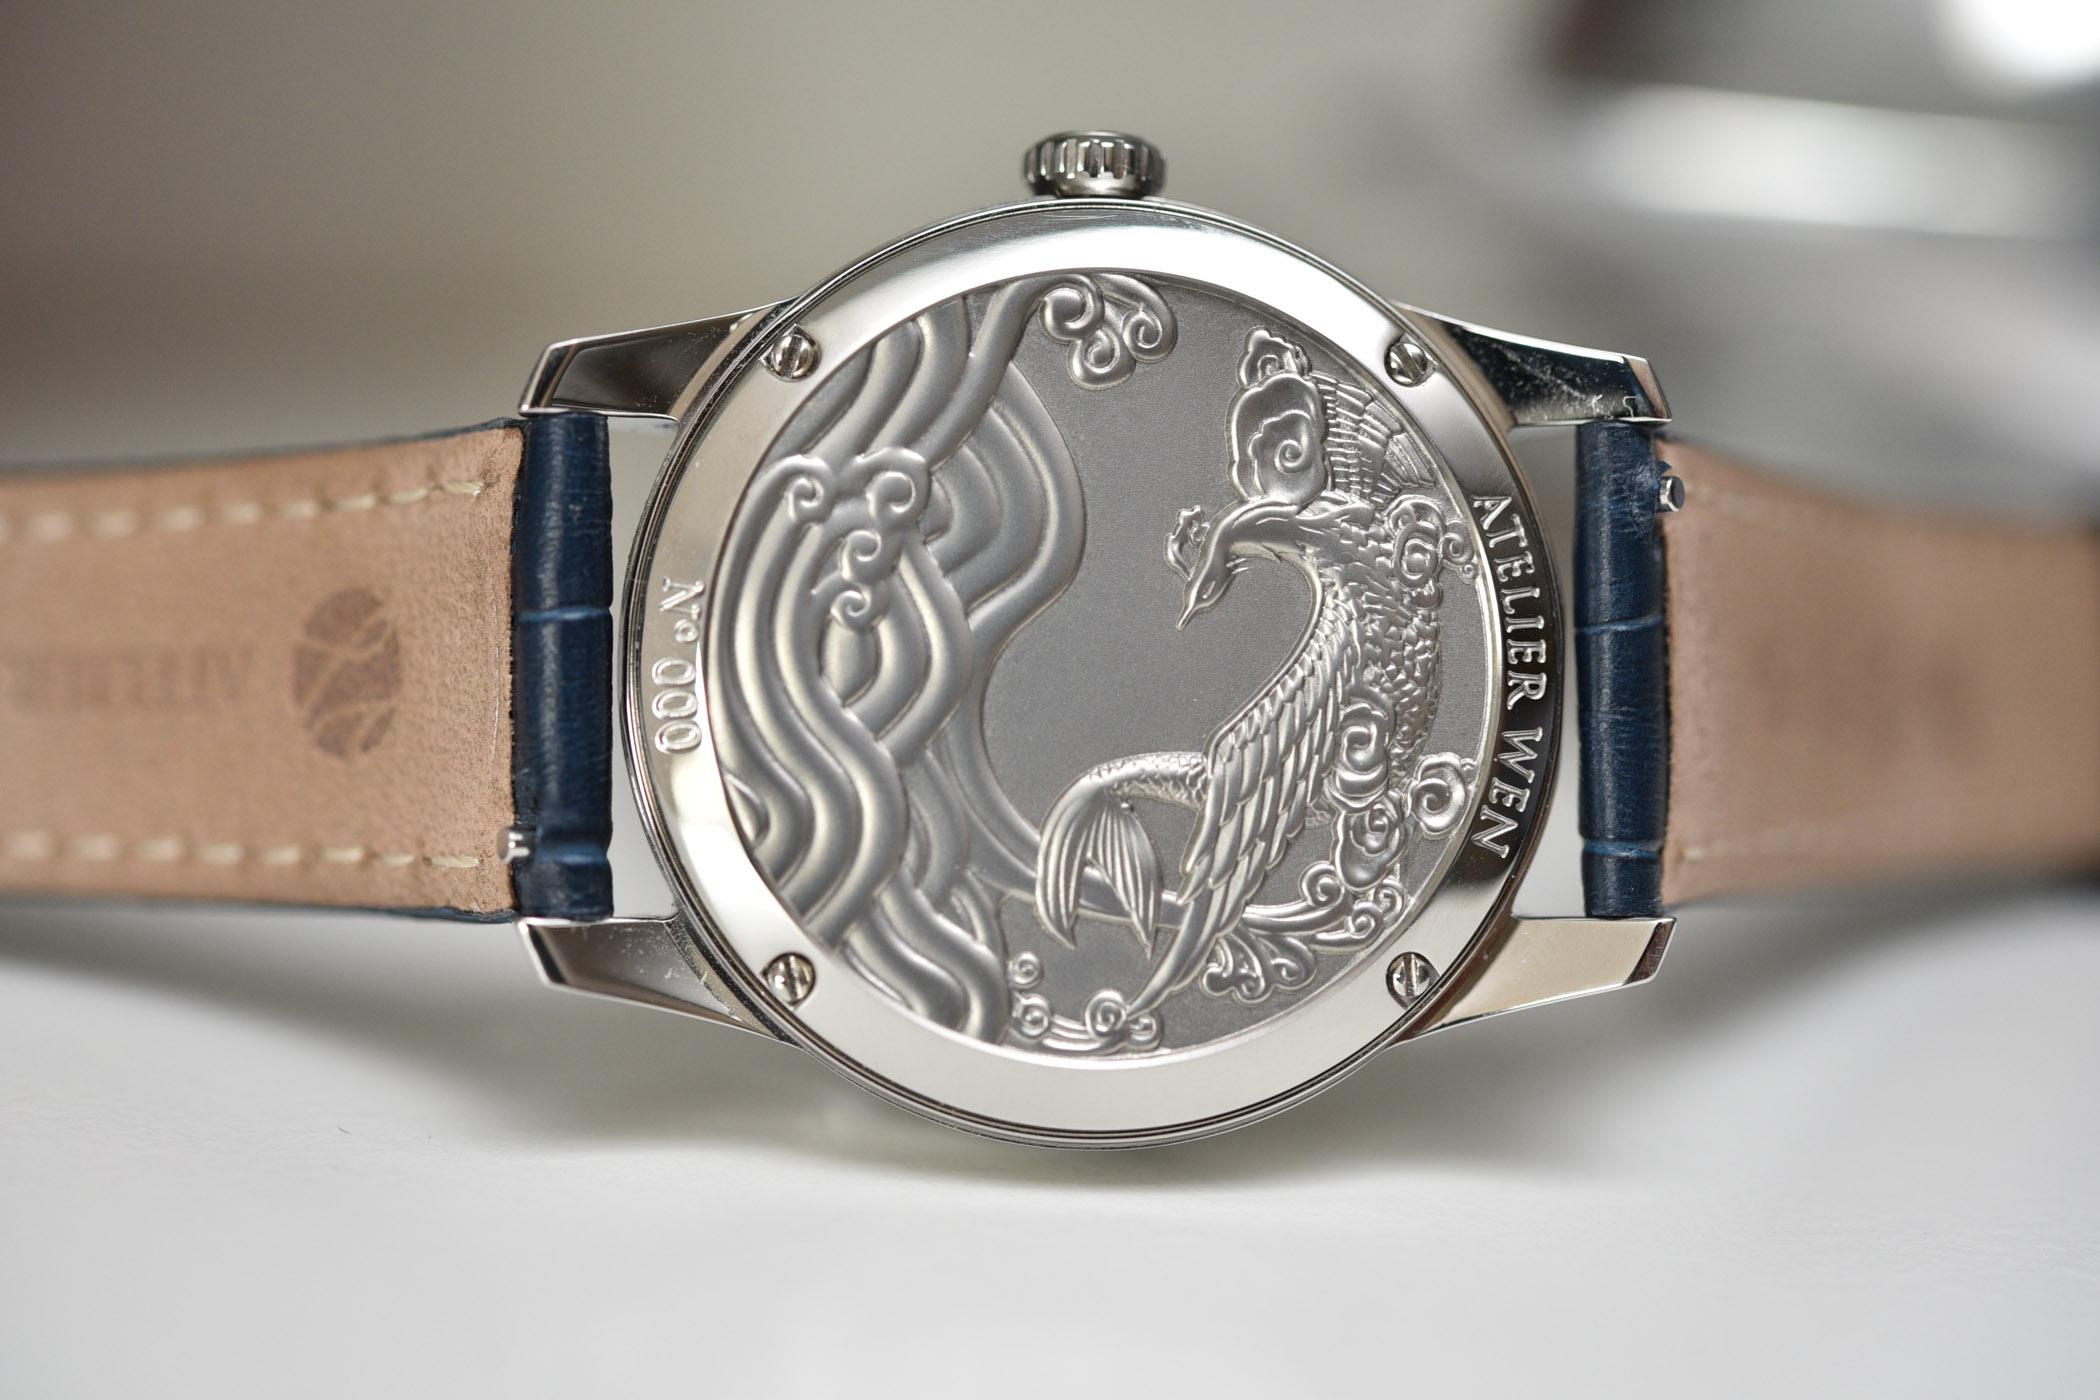 Atelier Wen Procelain dial China-inspired Watches Kickstarter - 4